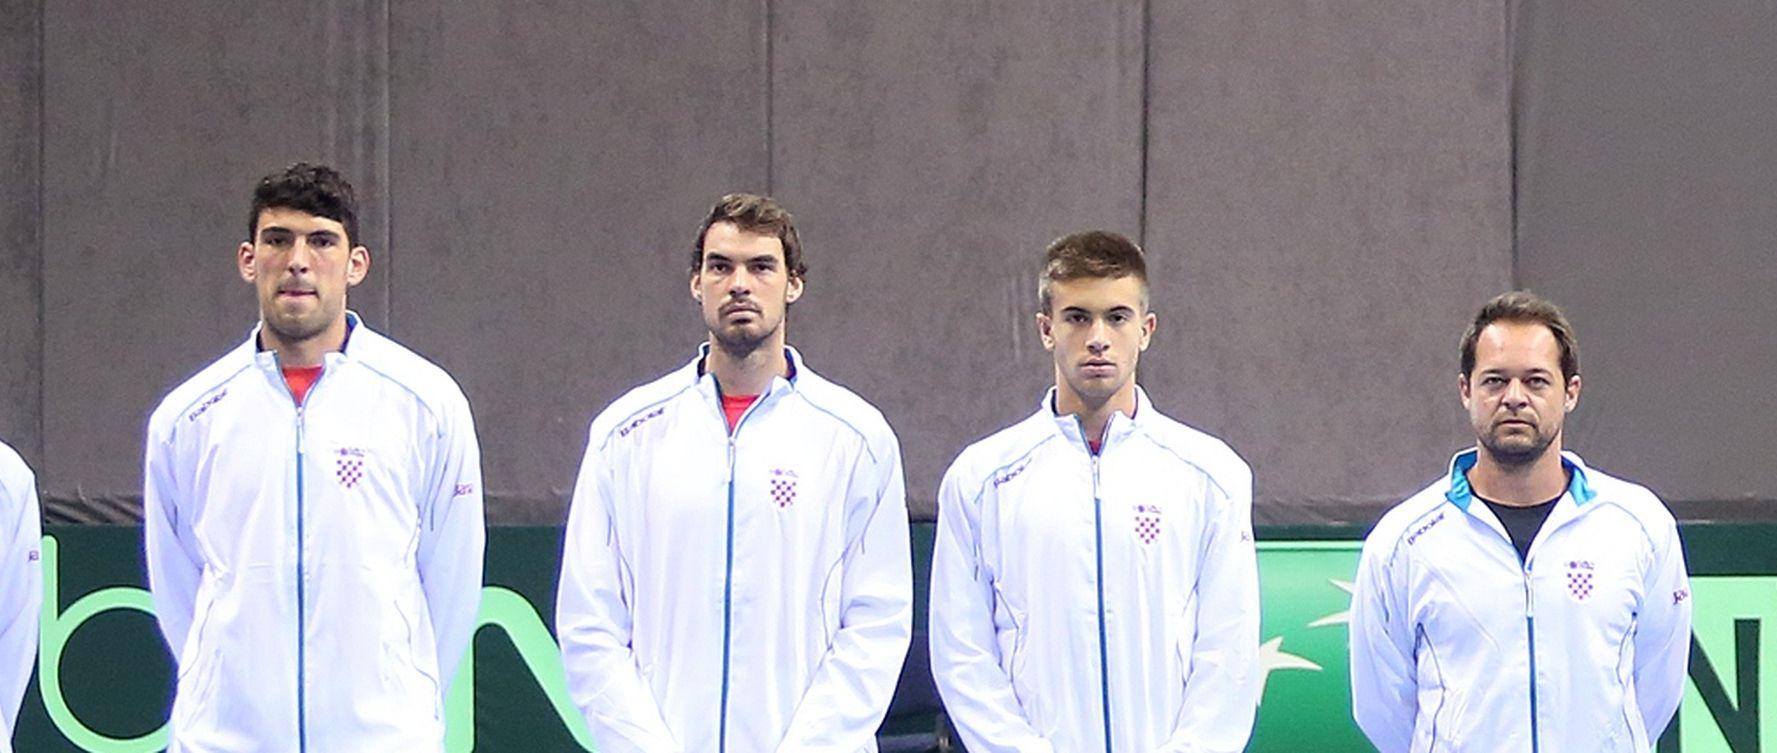 IDU K FINALISTU Davis Cup: Hrvatska u goste Belgiji